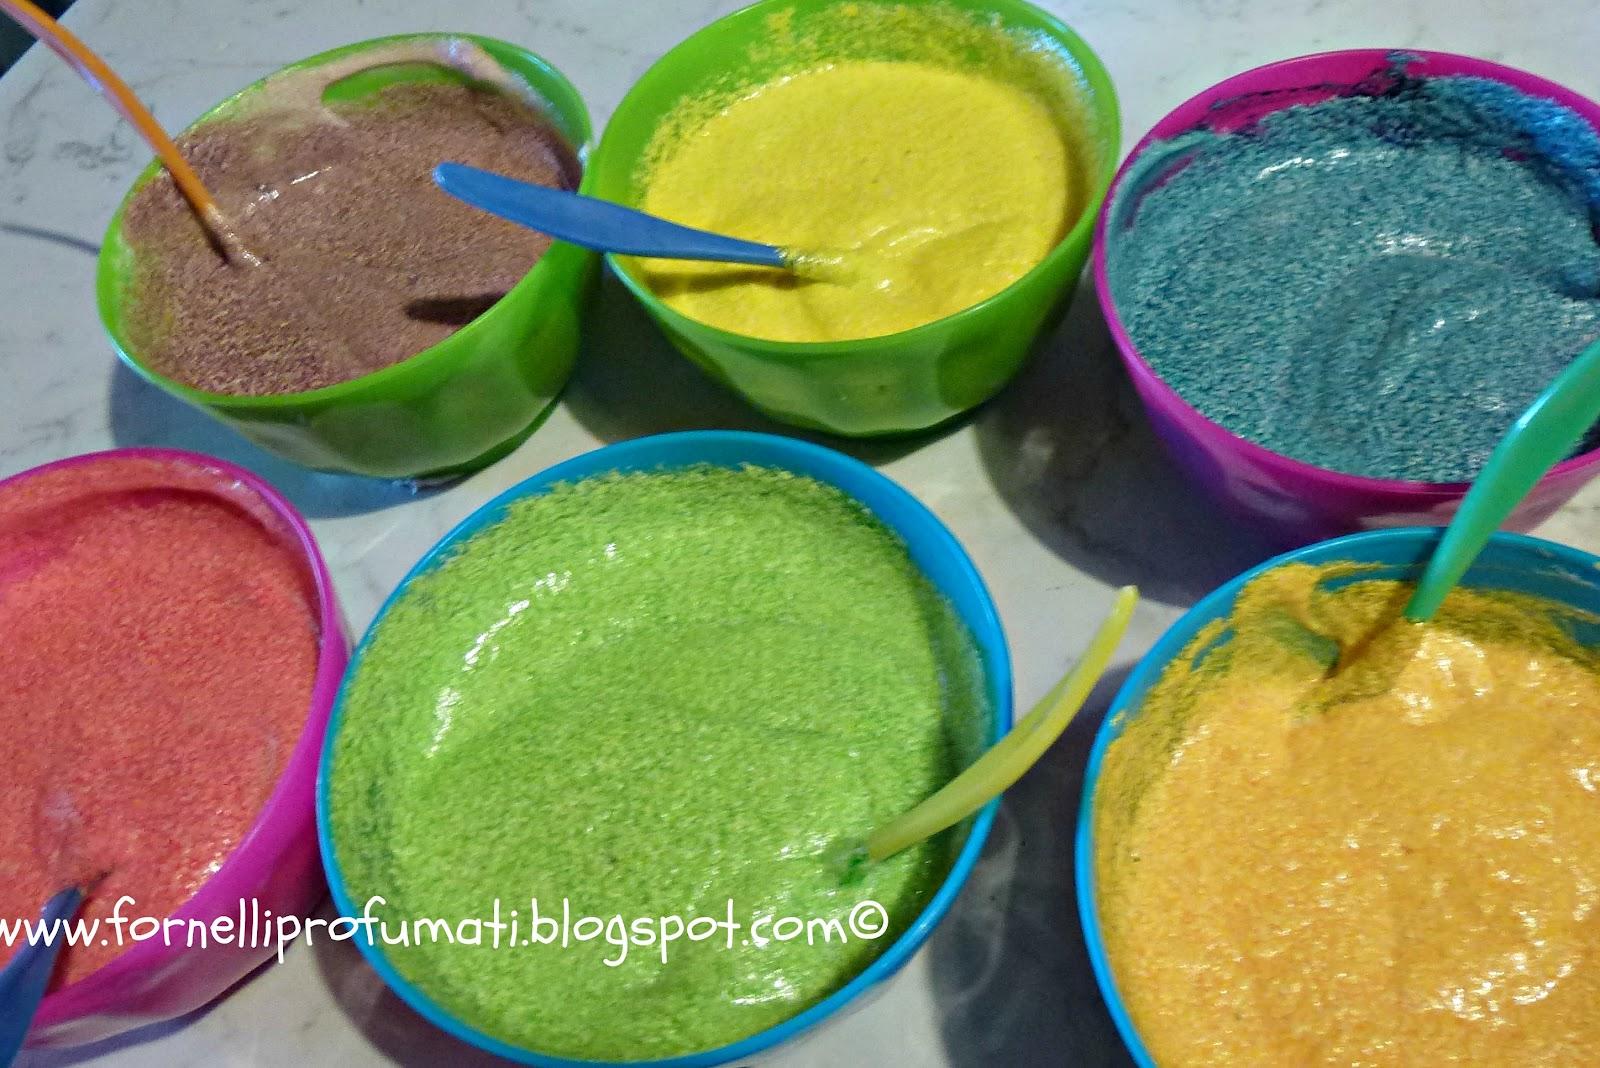 Martha stewart rainbow cake profumati tra il dolce e il salato